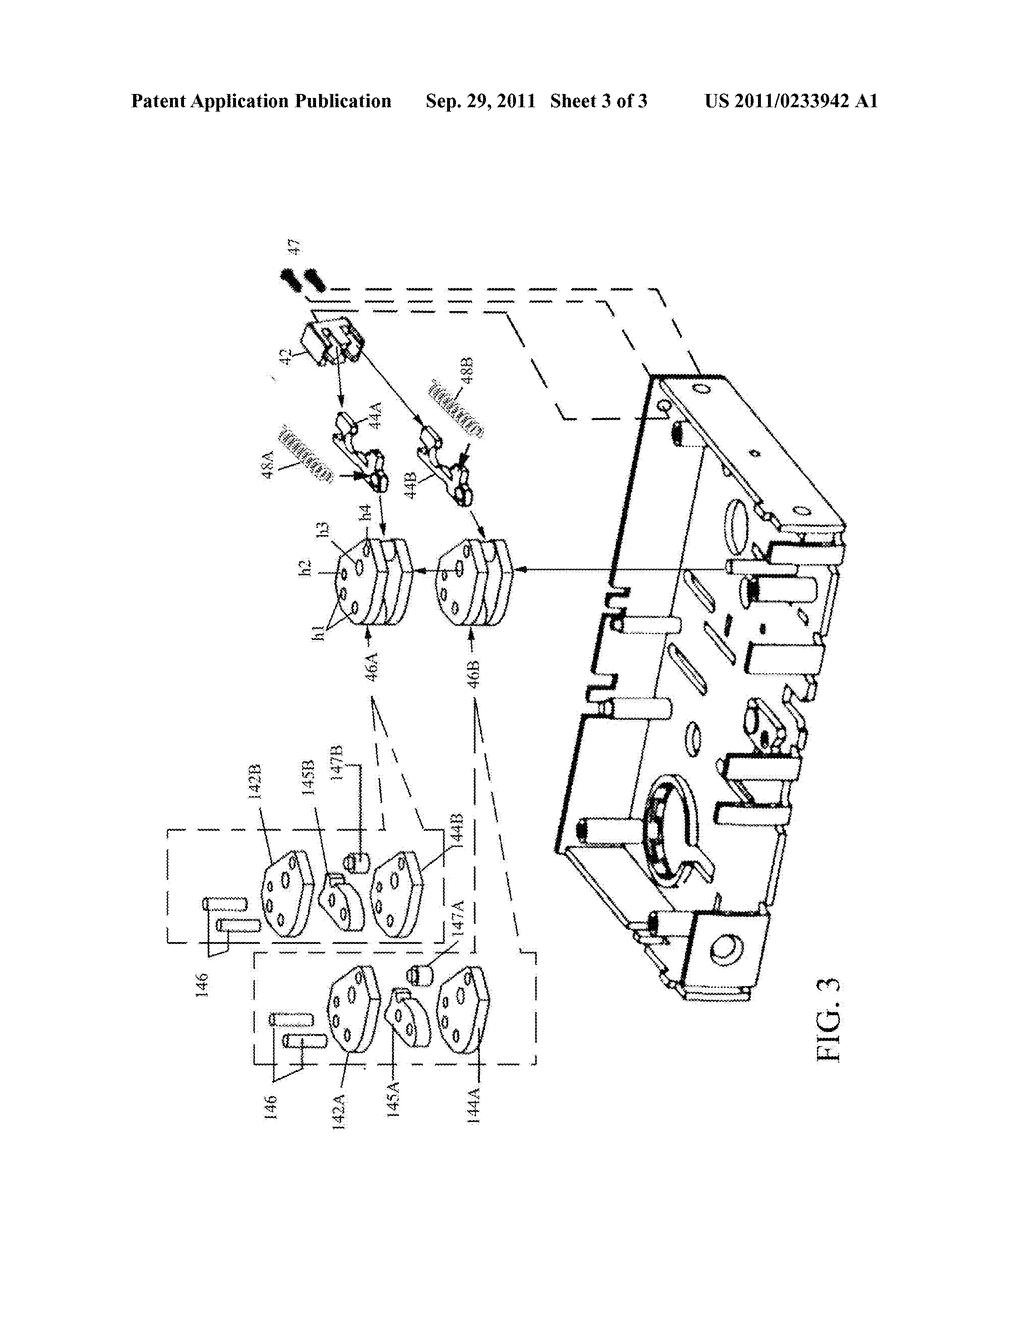 Mortise lock with dual reverse lockout mechanism diagram rh patentsencyclopedia garage door lock mechanism diagram key lock mechanism diagram